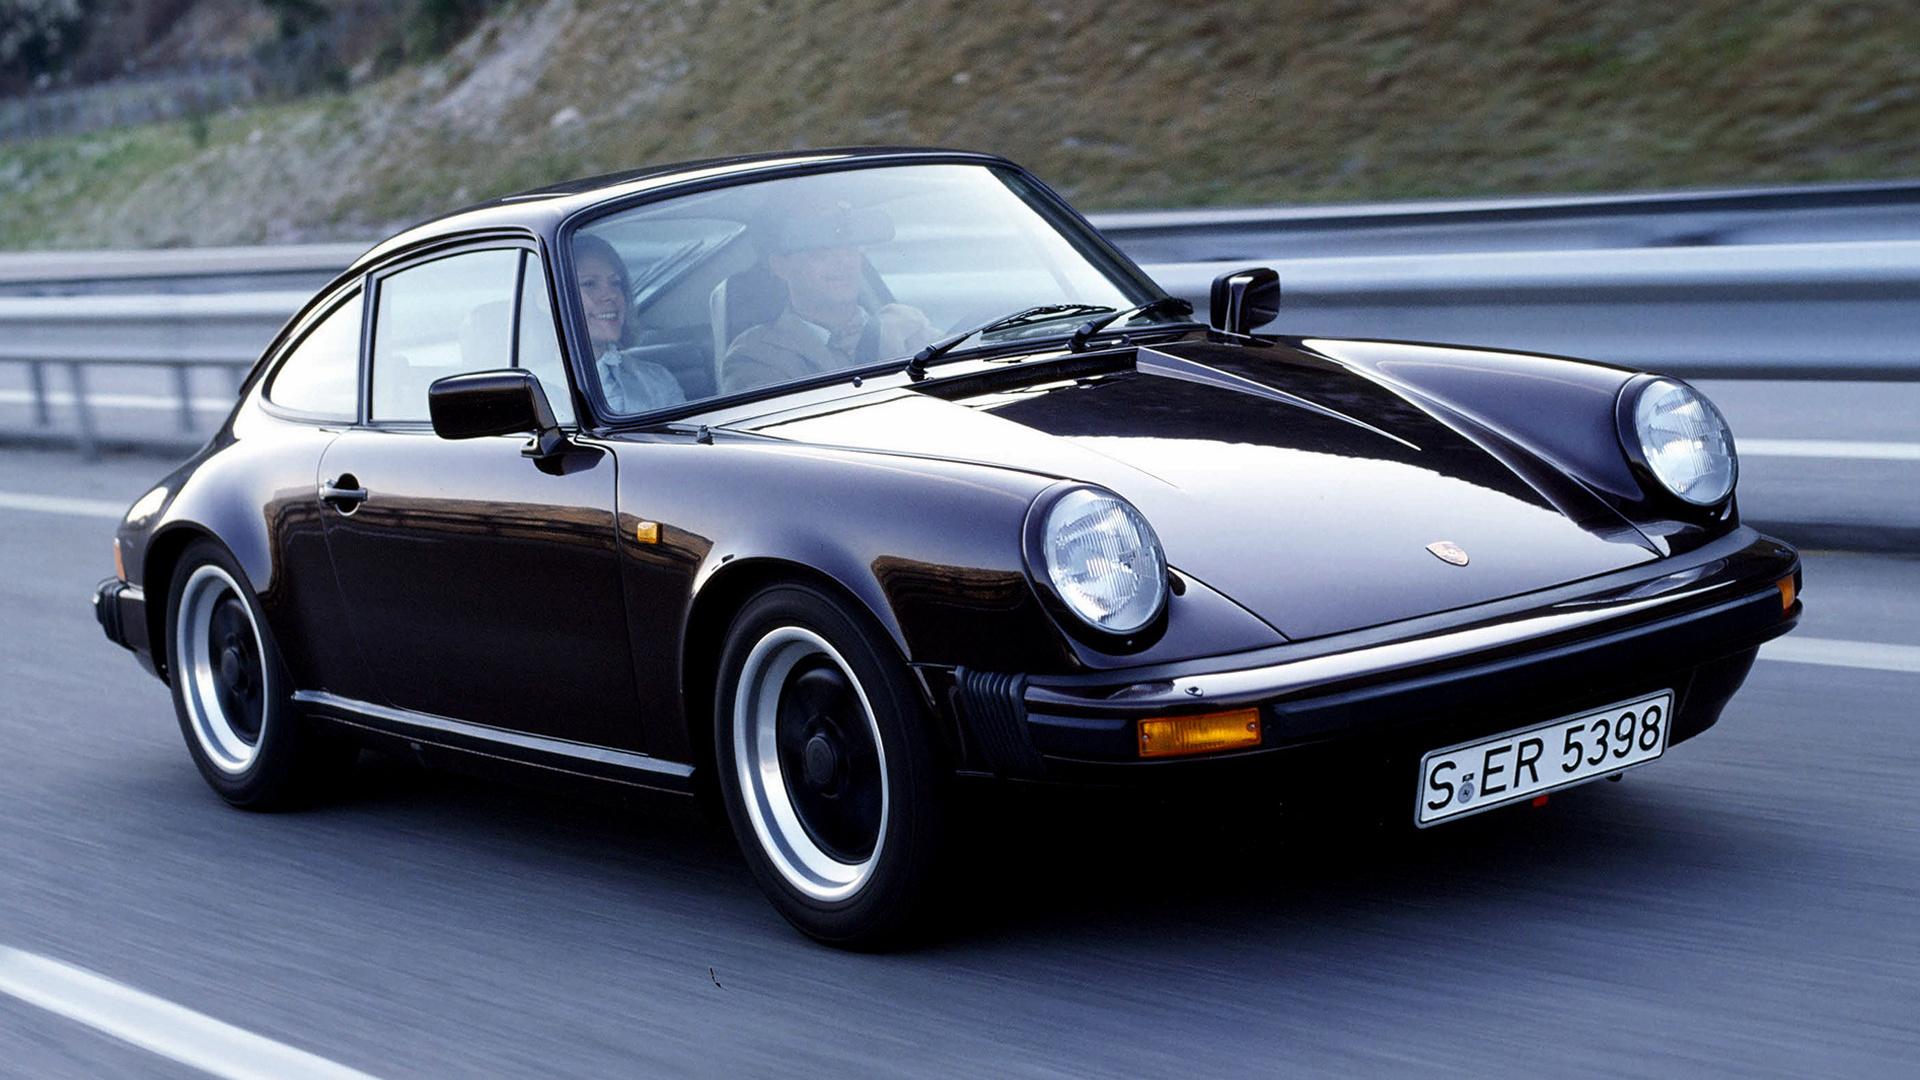 Porsche 911 Sc 1977 Wallpapers And Hd Images Car Pixel